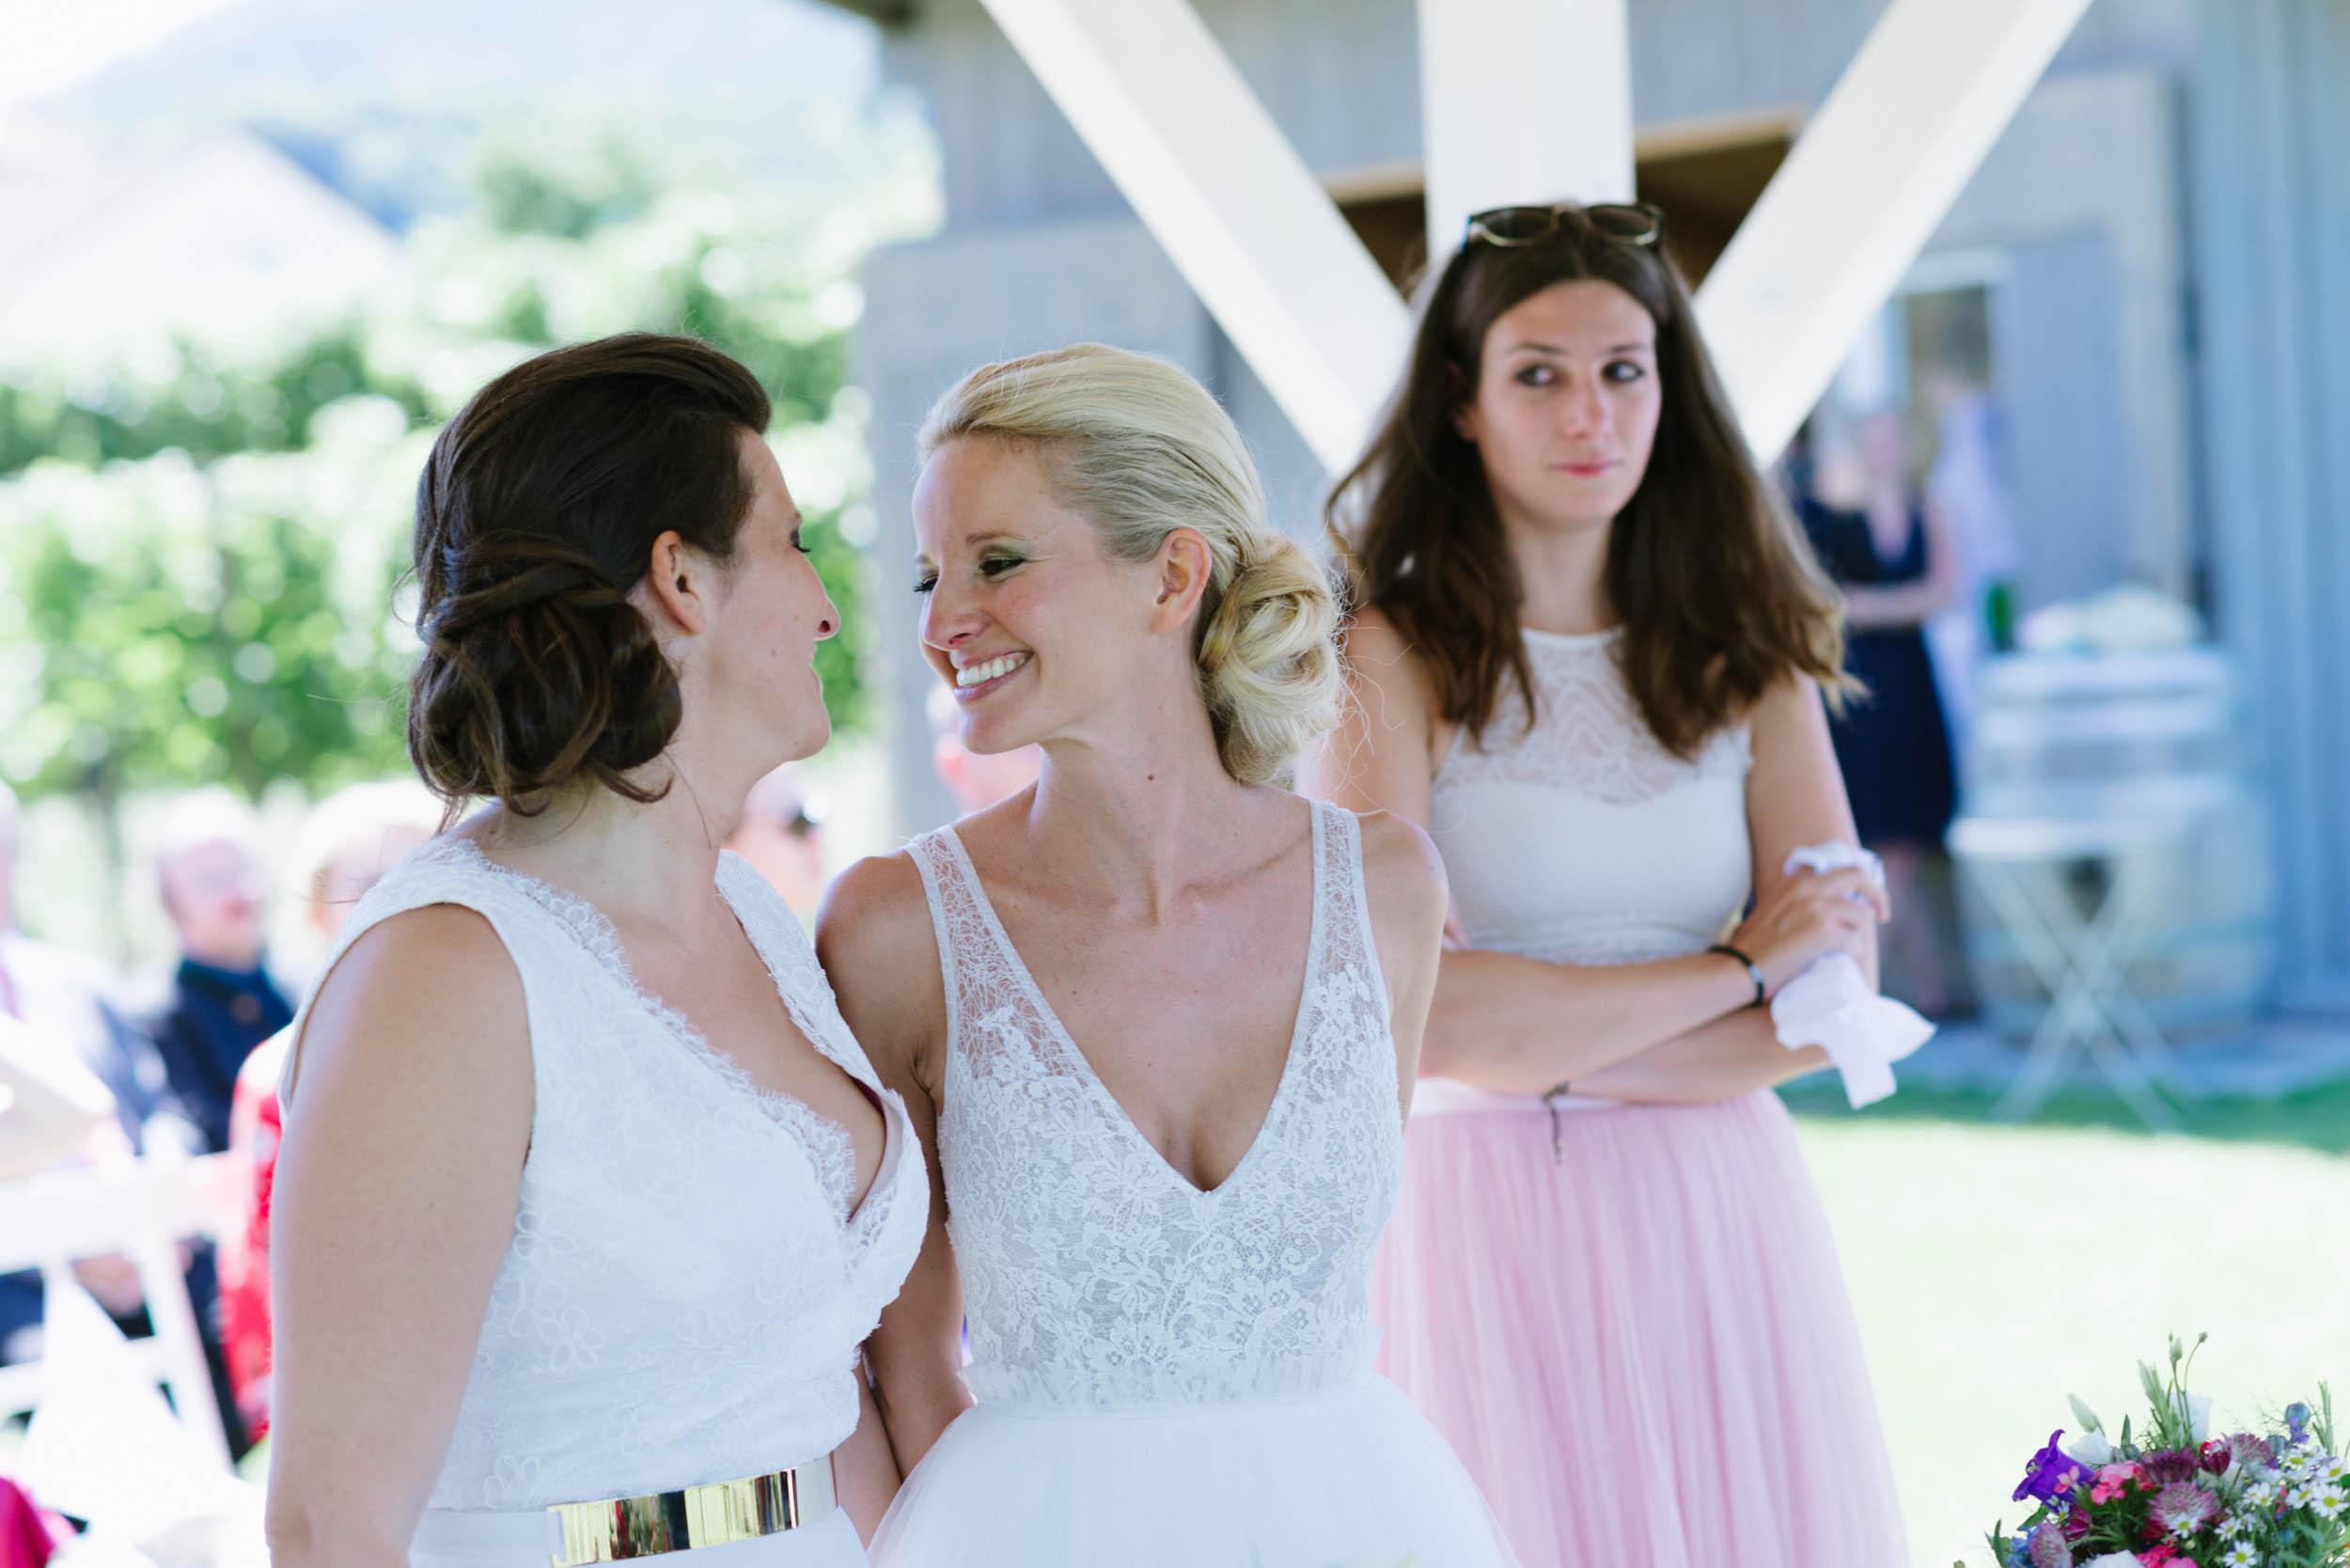 belle&sass__Lesbian Wedding in Austria_0051.jpg